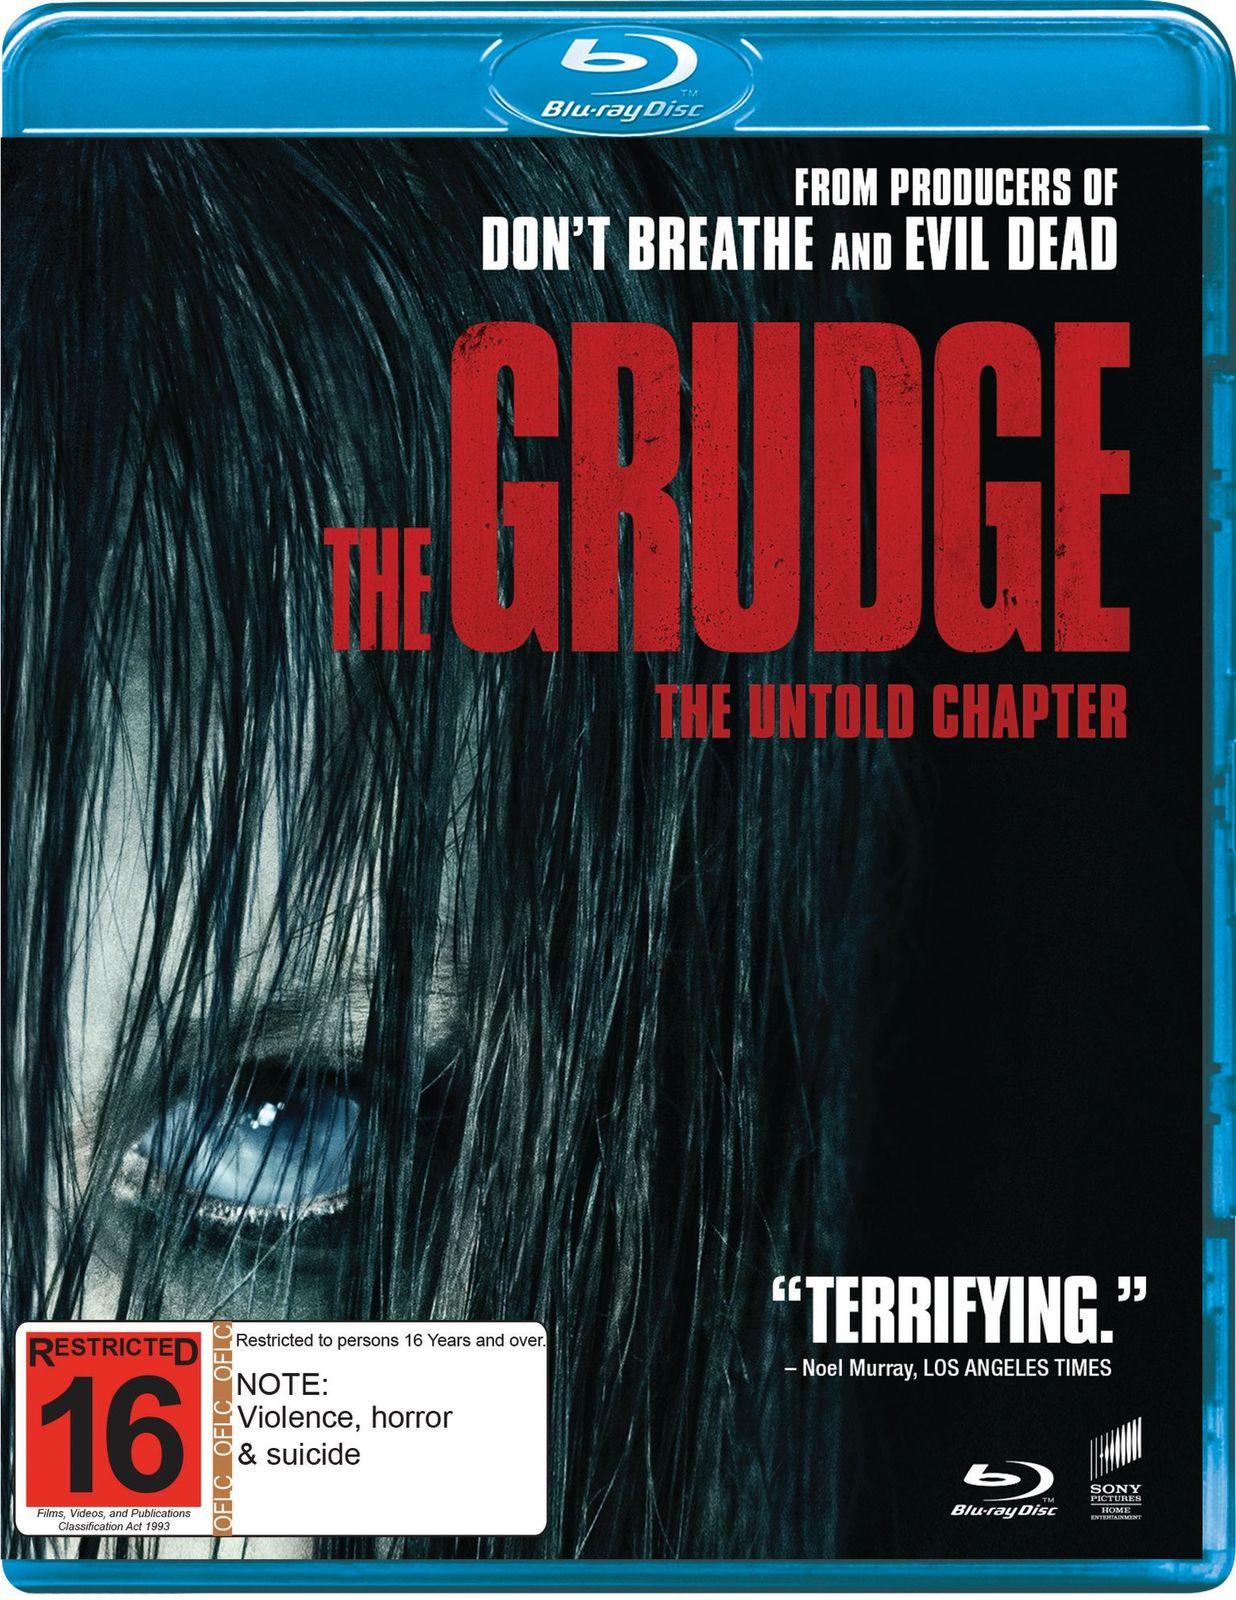 The Grudge (2020) on Blu-ray image